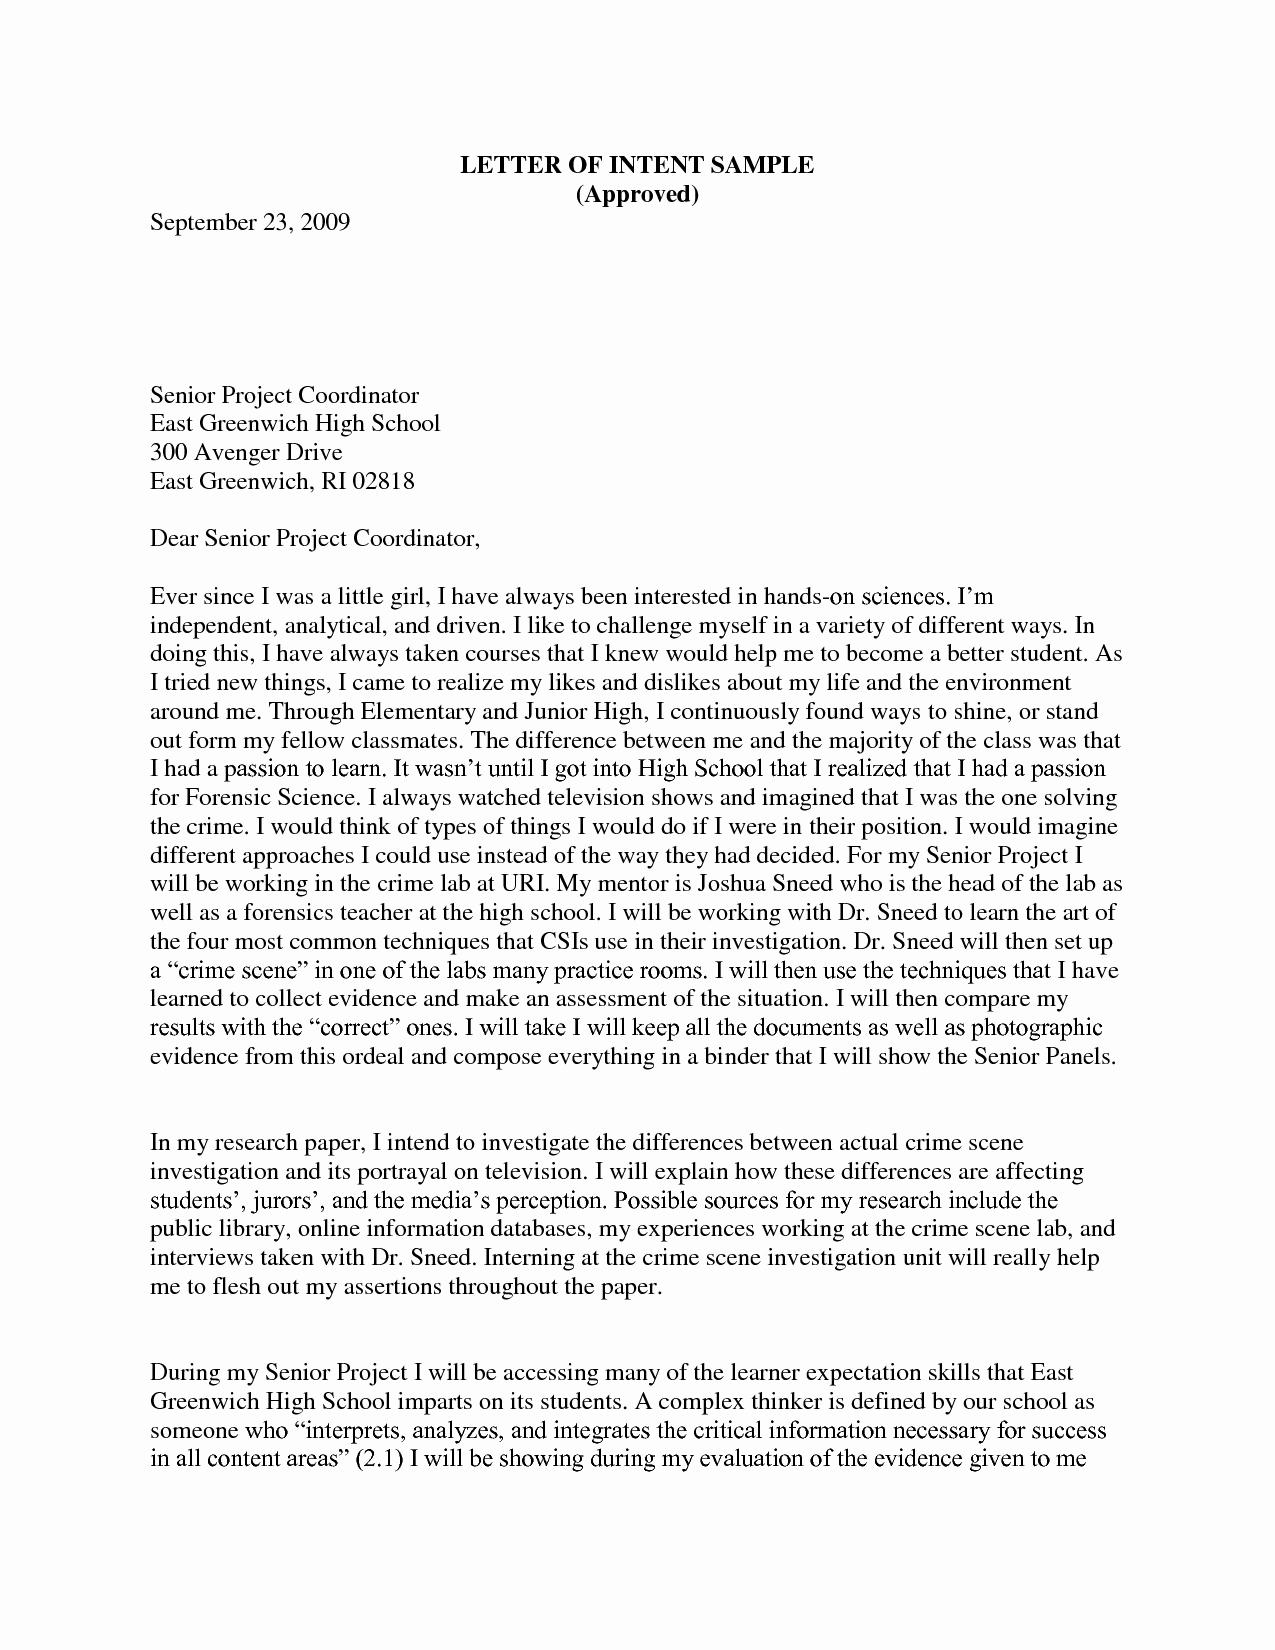 Nursing Letter Of Intent New Best S Of School Nurse Letter Interest Letter Of Interest School Nurse Nursing School